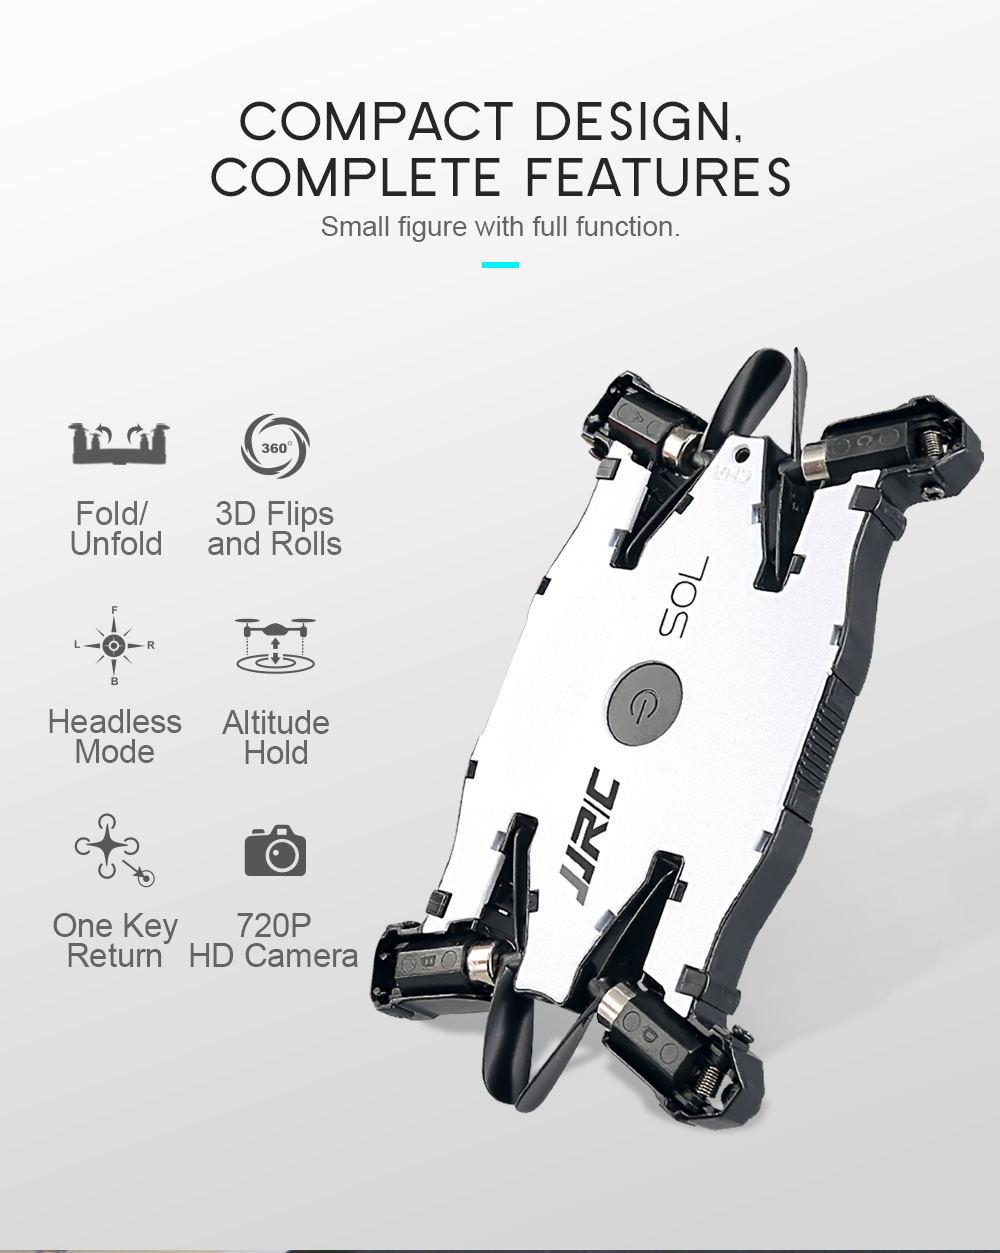 new jjrc h49 sol mini foldable rc pocket selfie drone